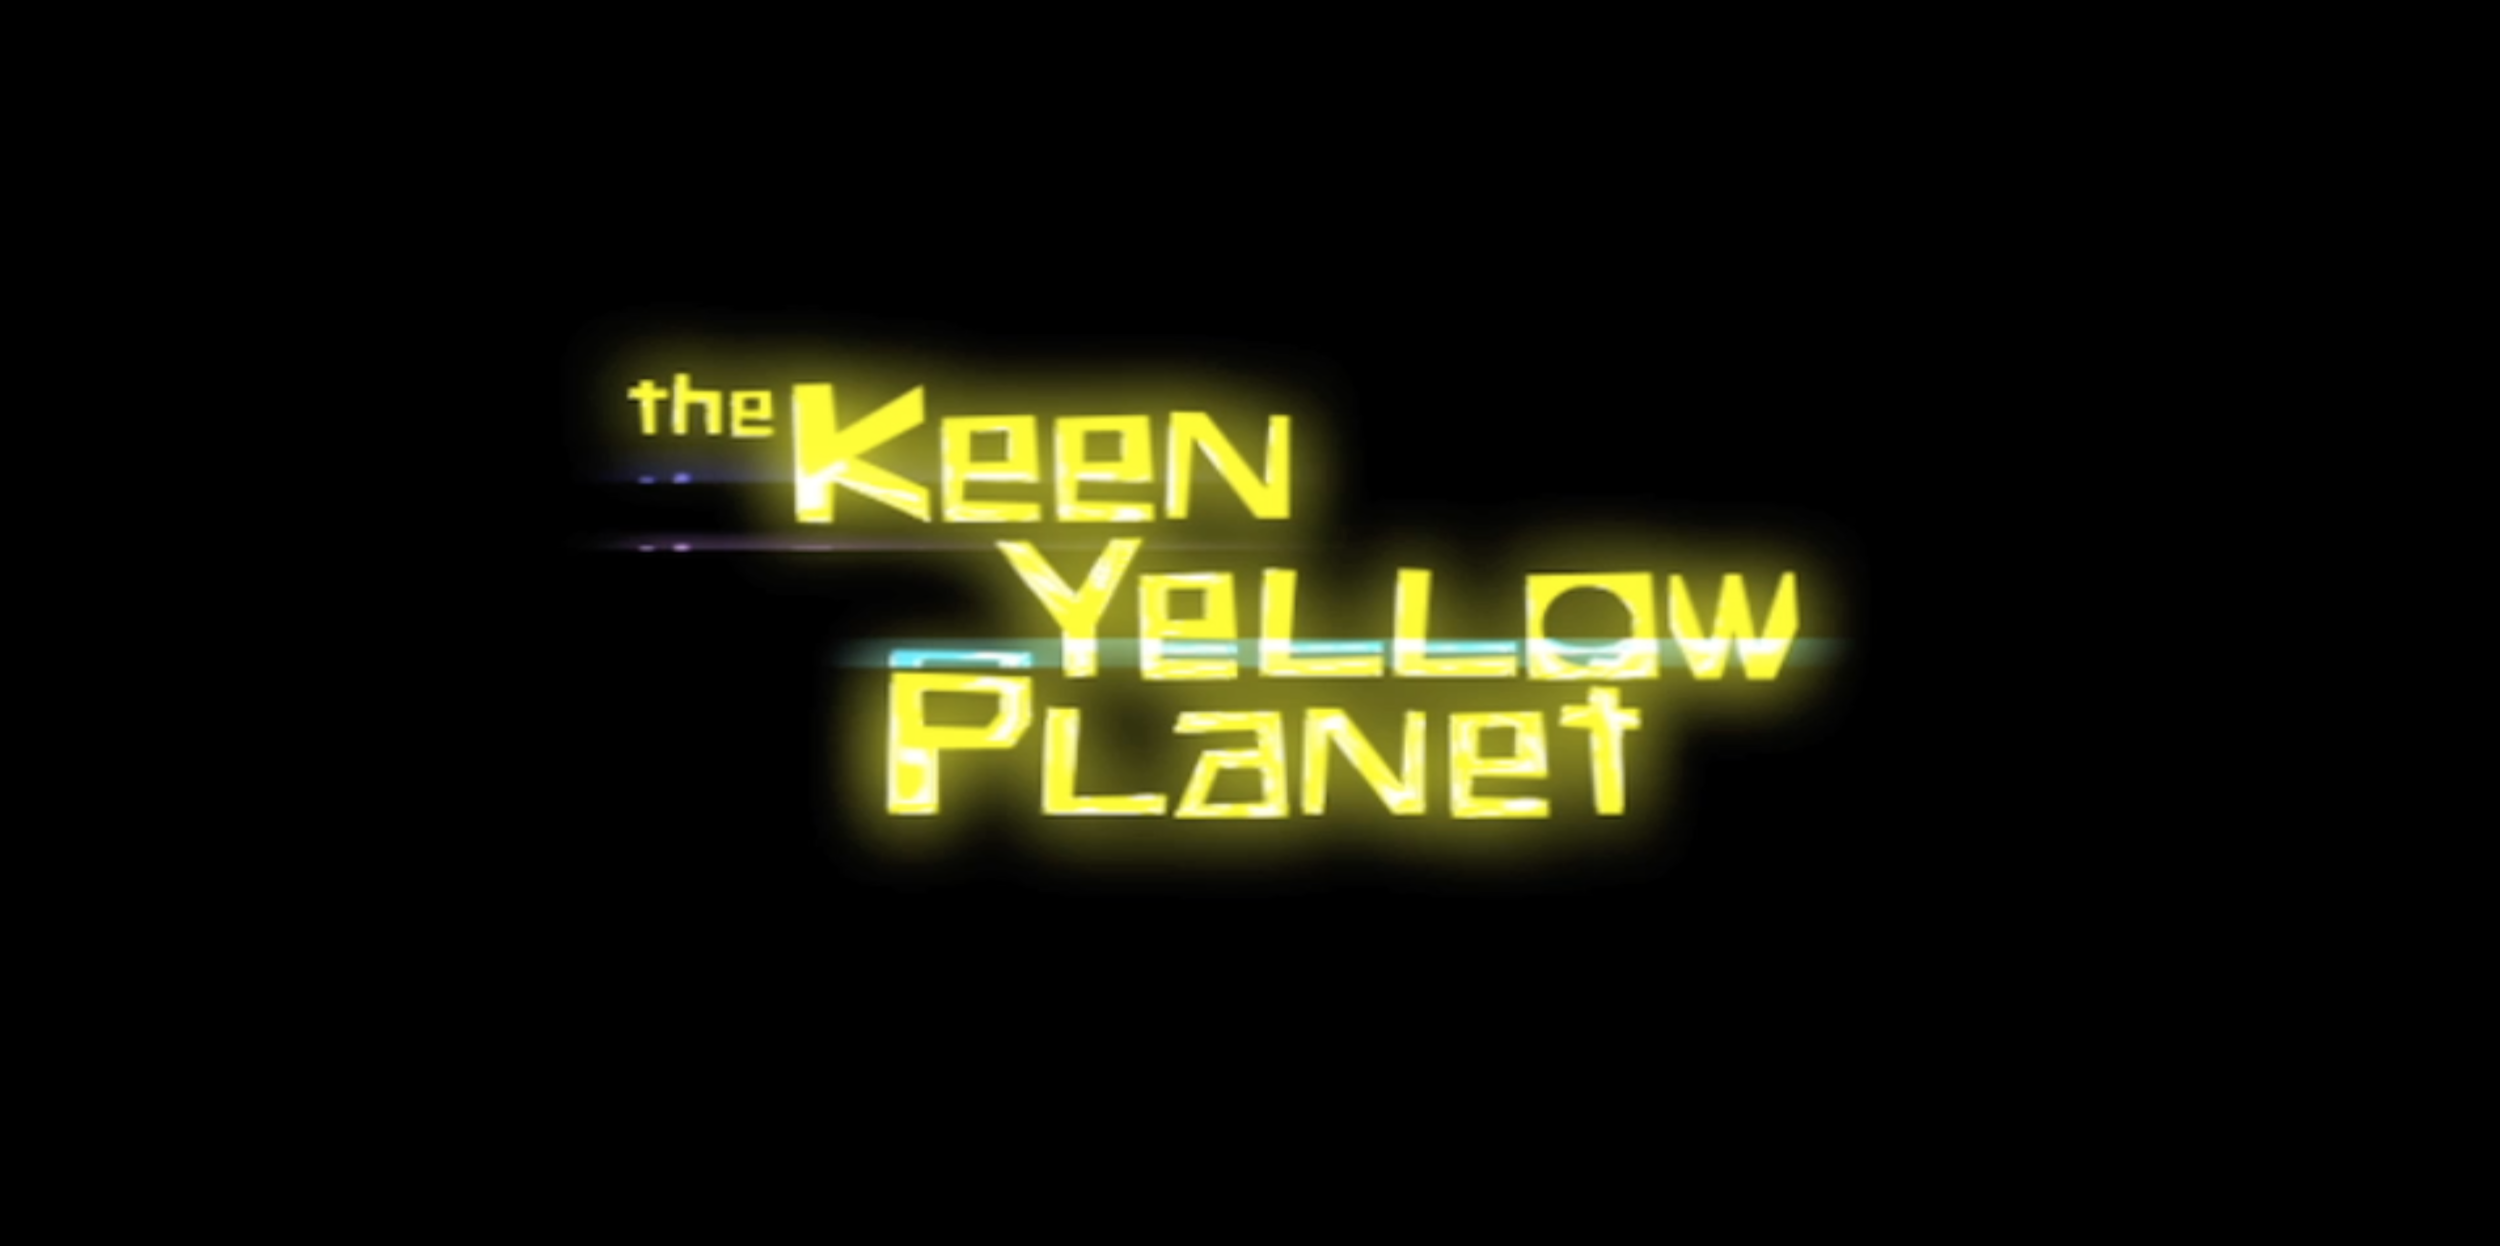 KeenYellowPlanet_001.png